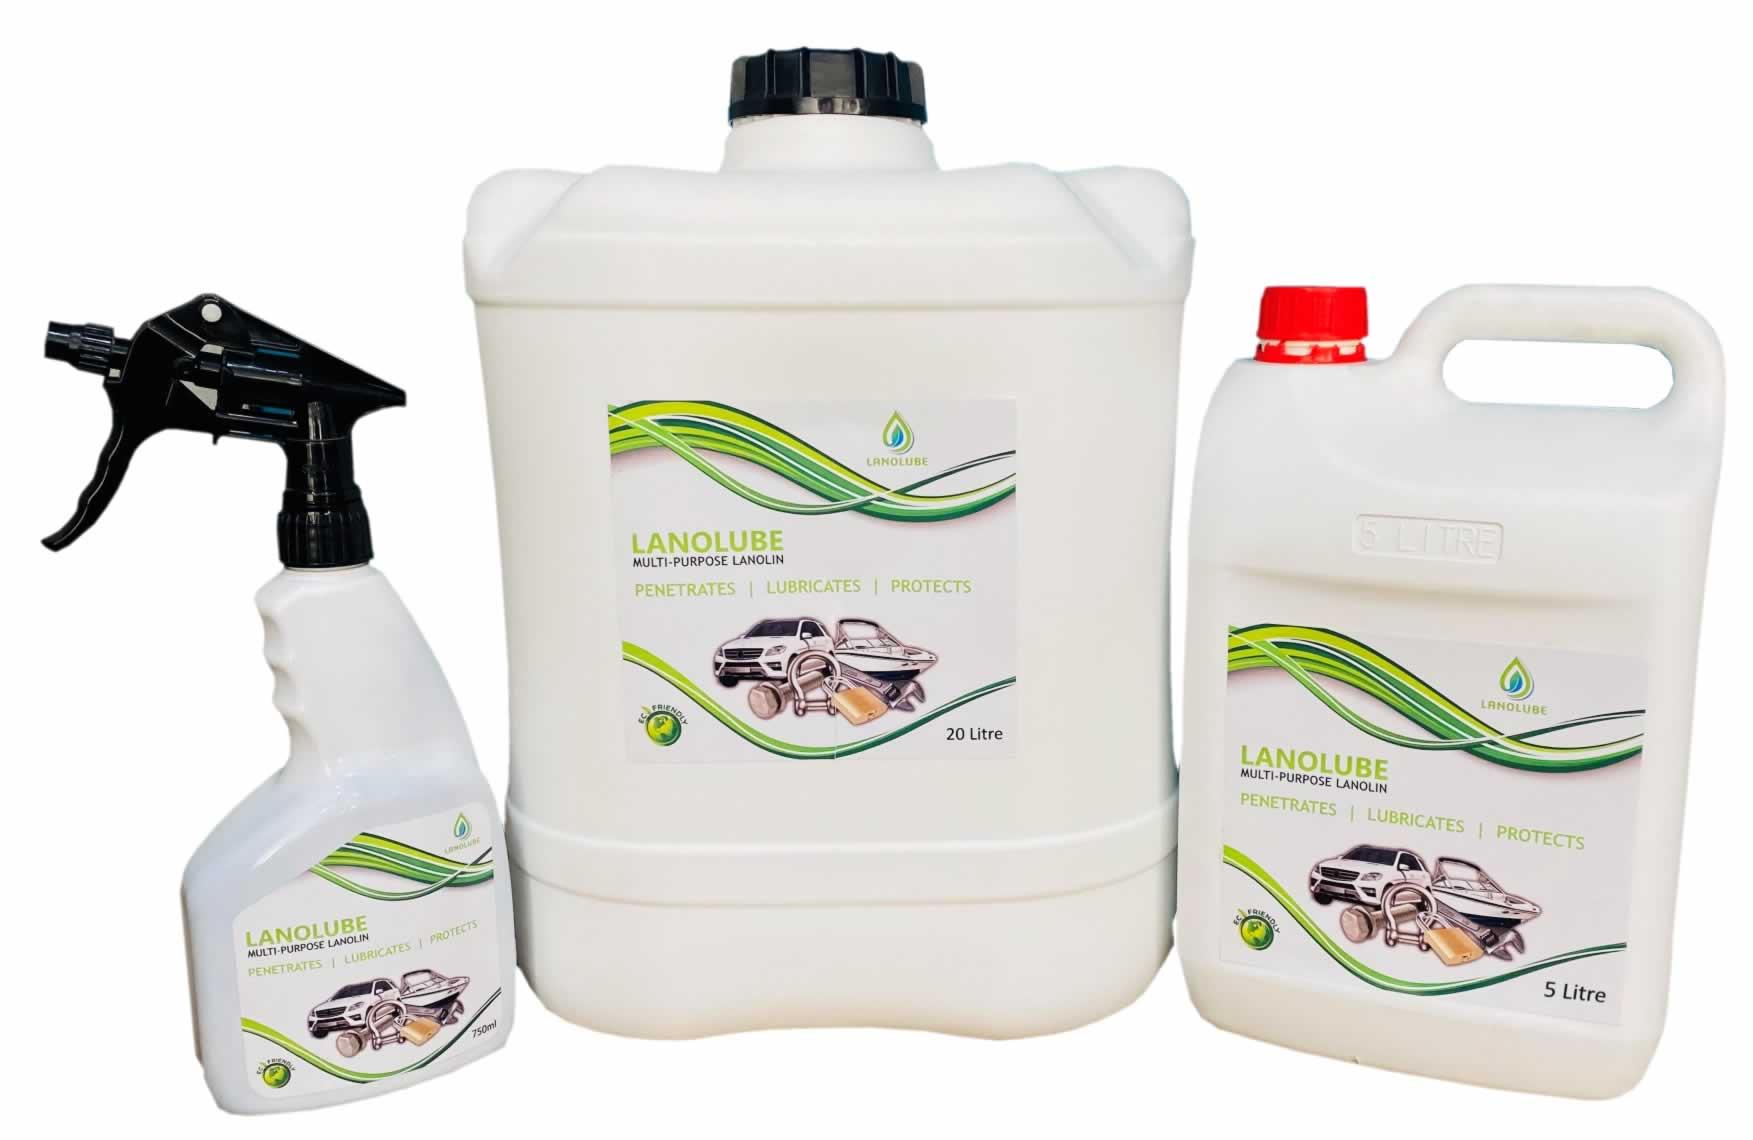 Lanolube Multi Purpose Lanolin